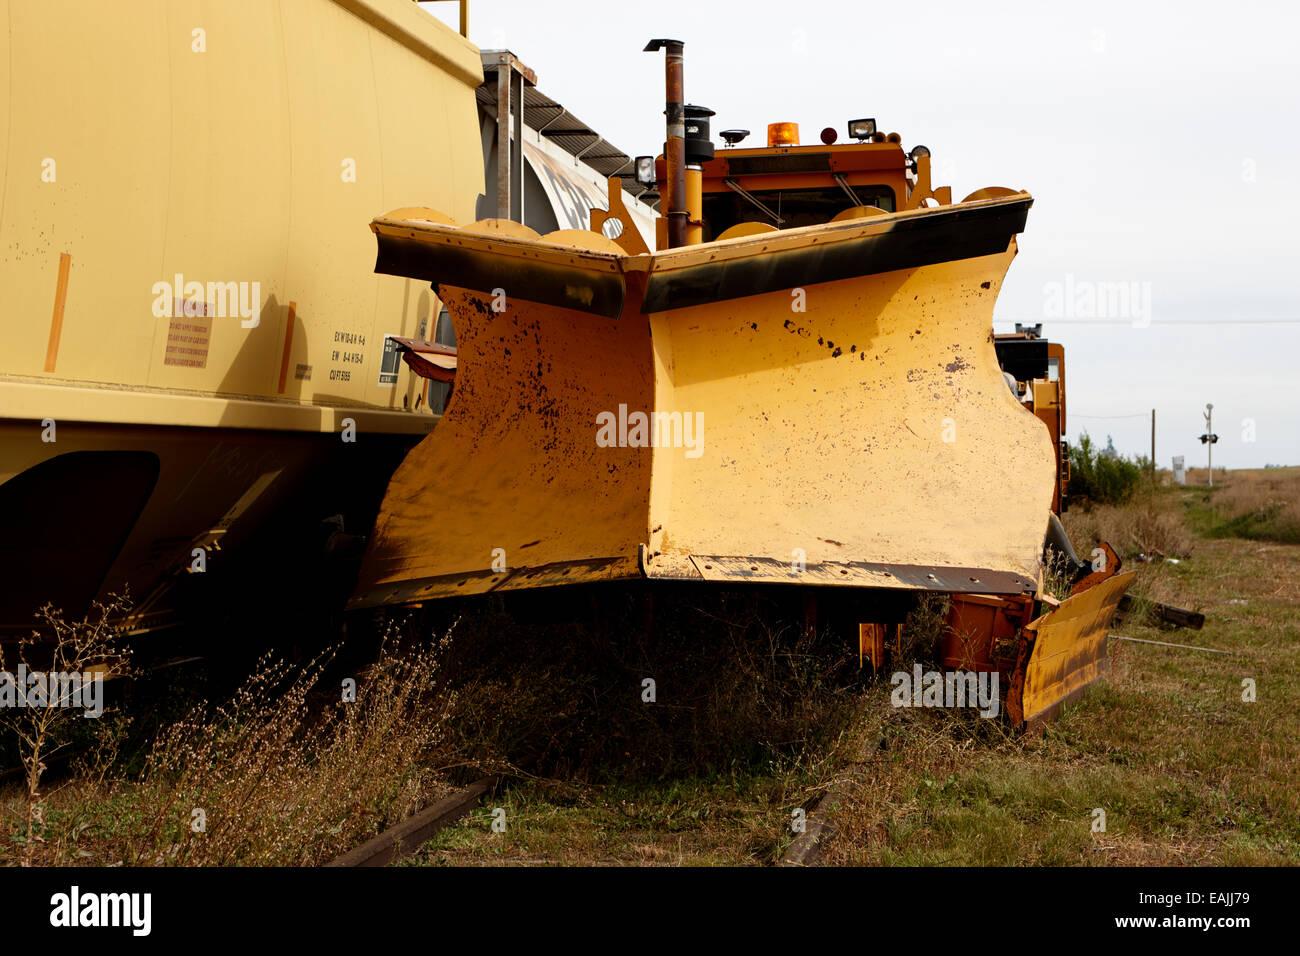 snowplow on kershaw ballast compactor regulator snow fighter leader Saskatchewan Canada - Stock Image